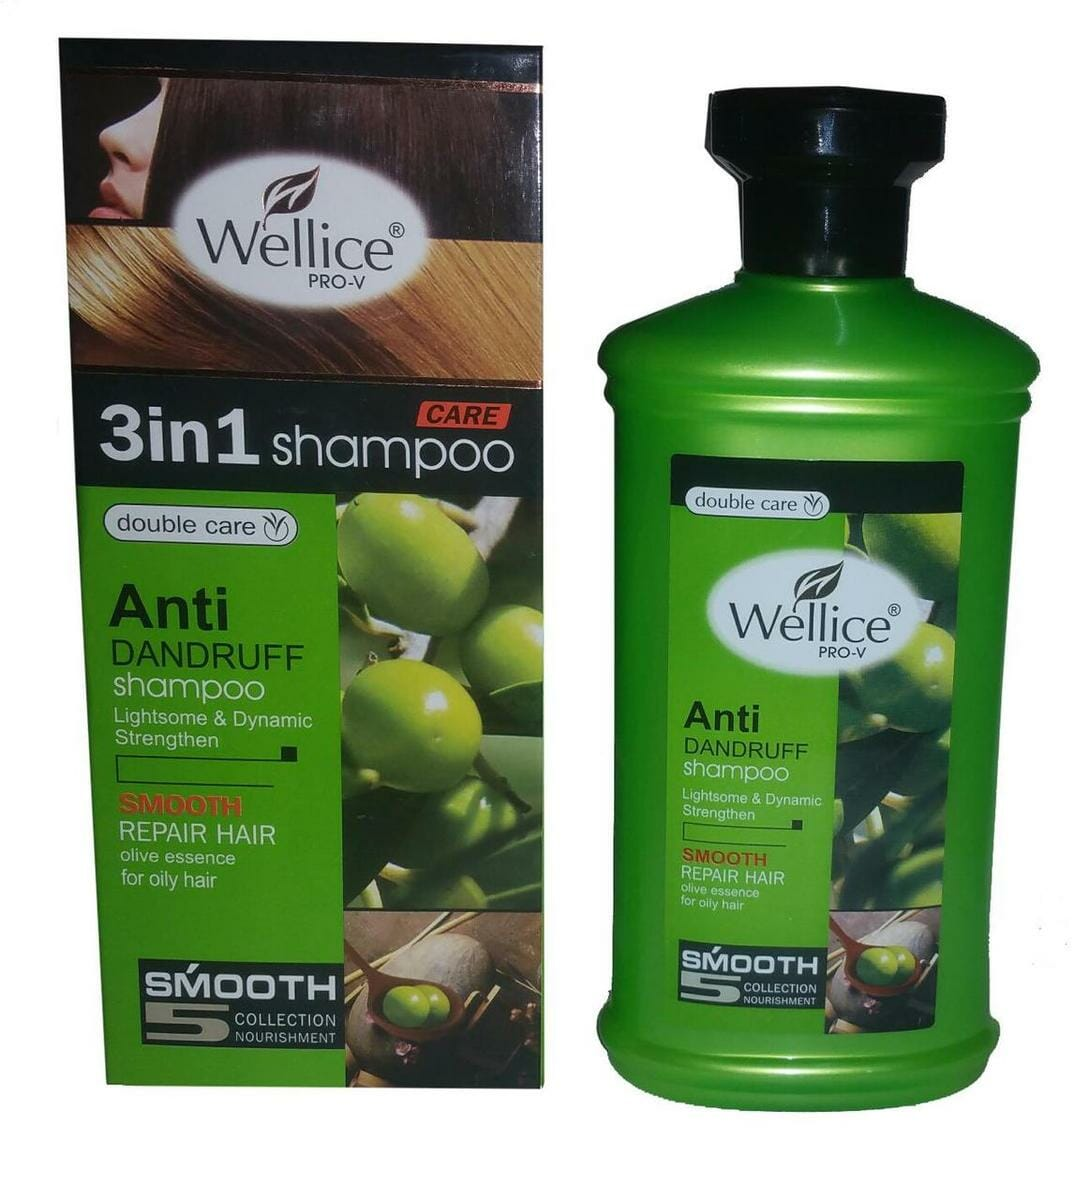 Wellice Olive Shampoo 3 in 1 Professional Flexible Healthy Care 400 gm Best Organic Shampoo in Pakistan